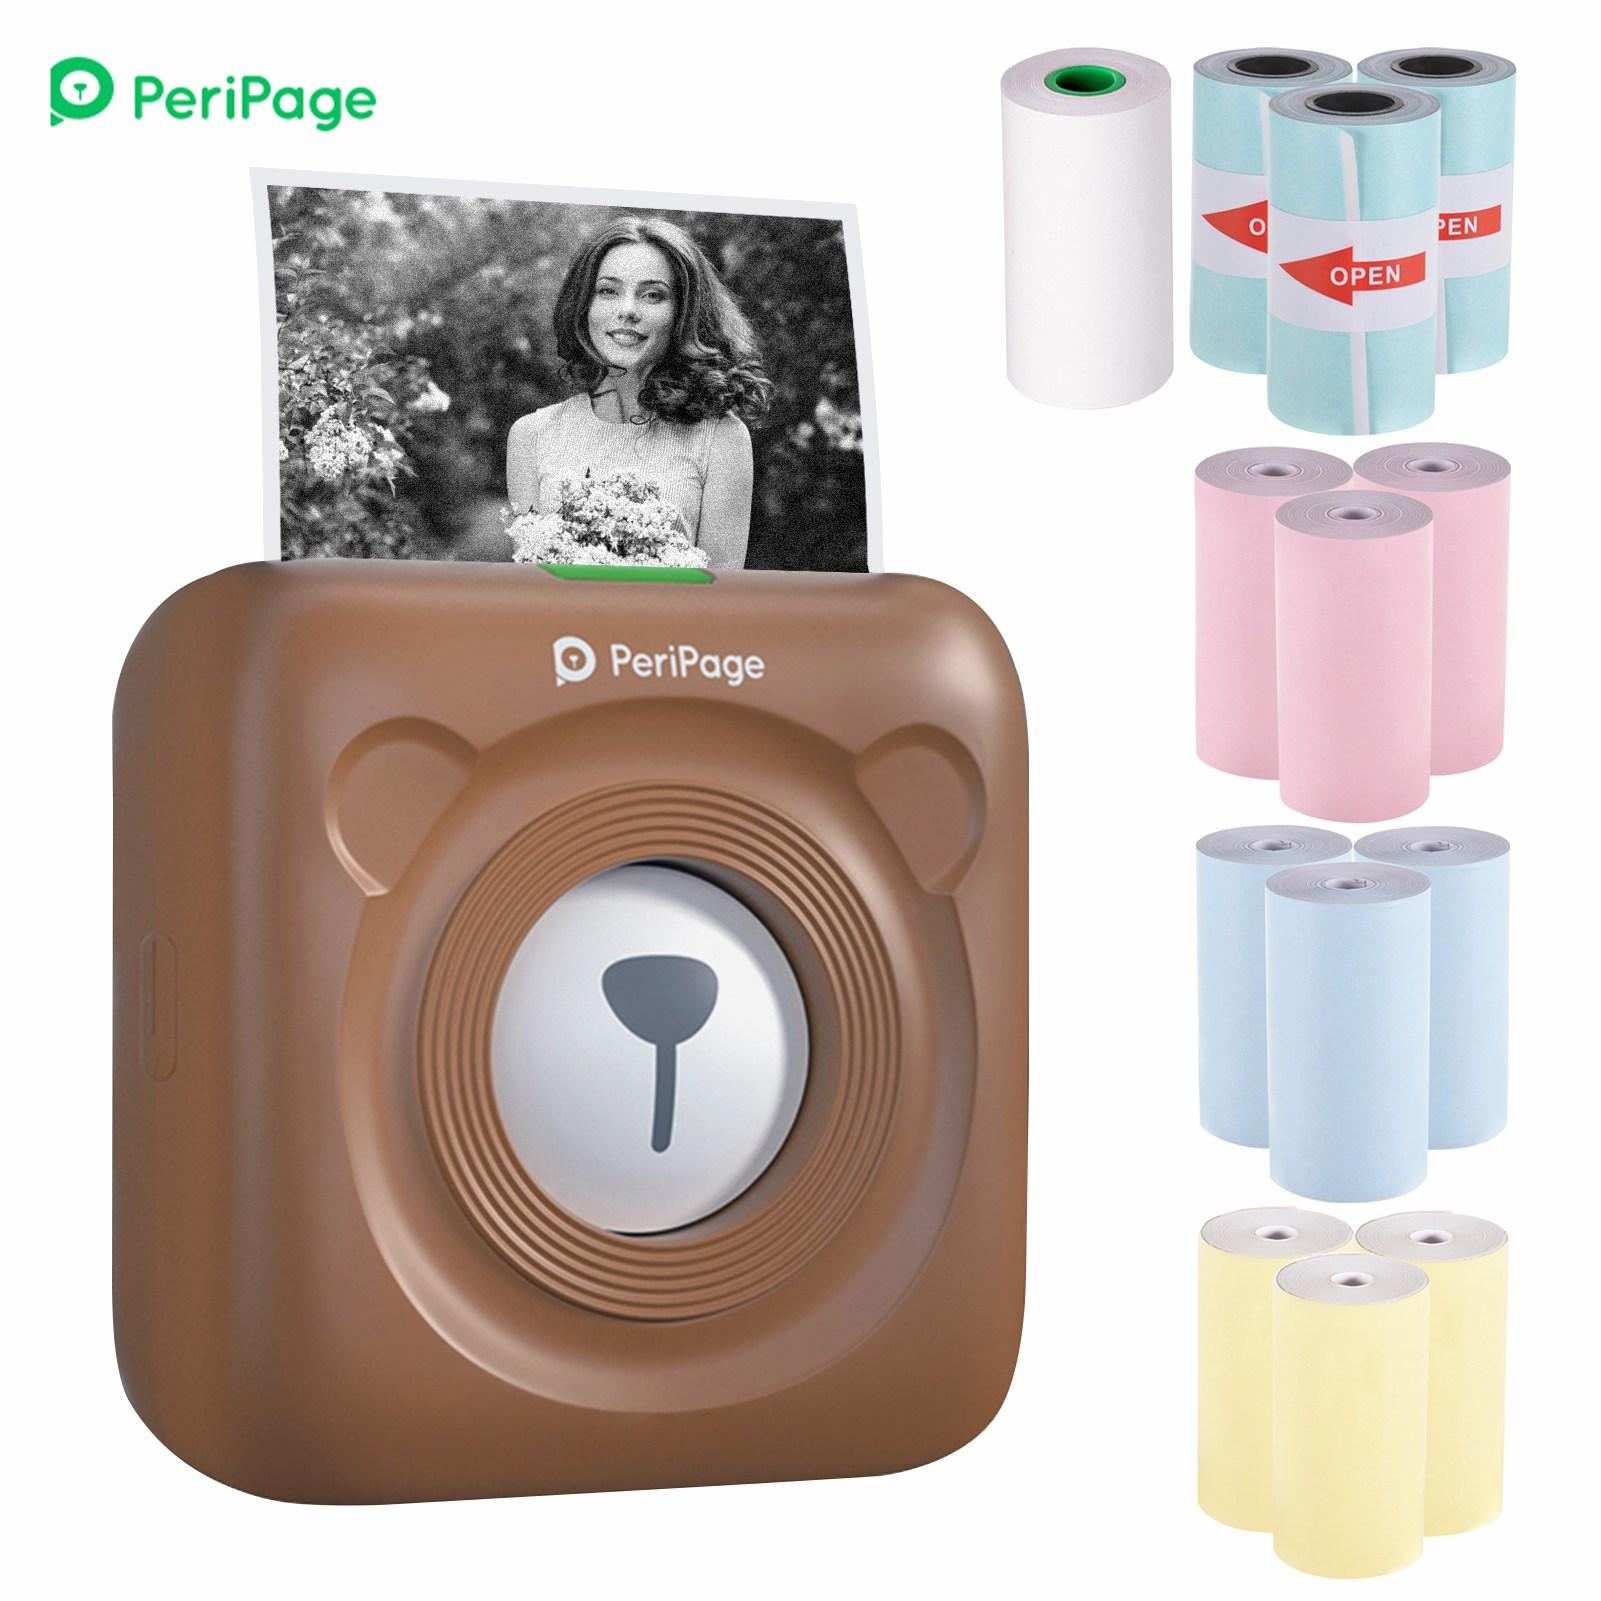 PeriPage 휴대용 미니 블루투스 라벨프린터 + 프린터라벨지 13롤, 1세트, 브라운